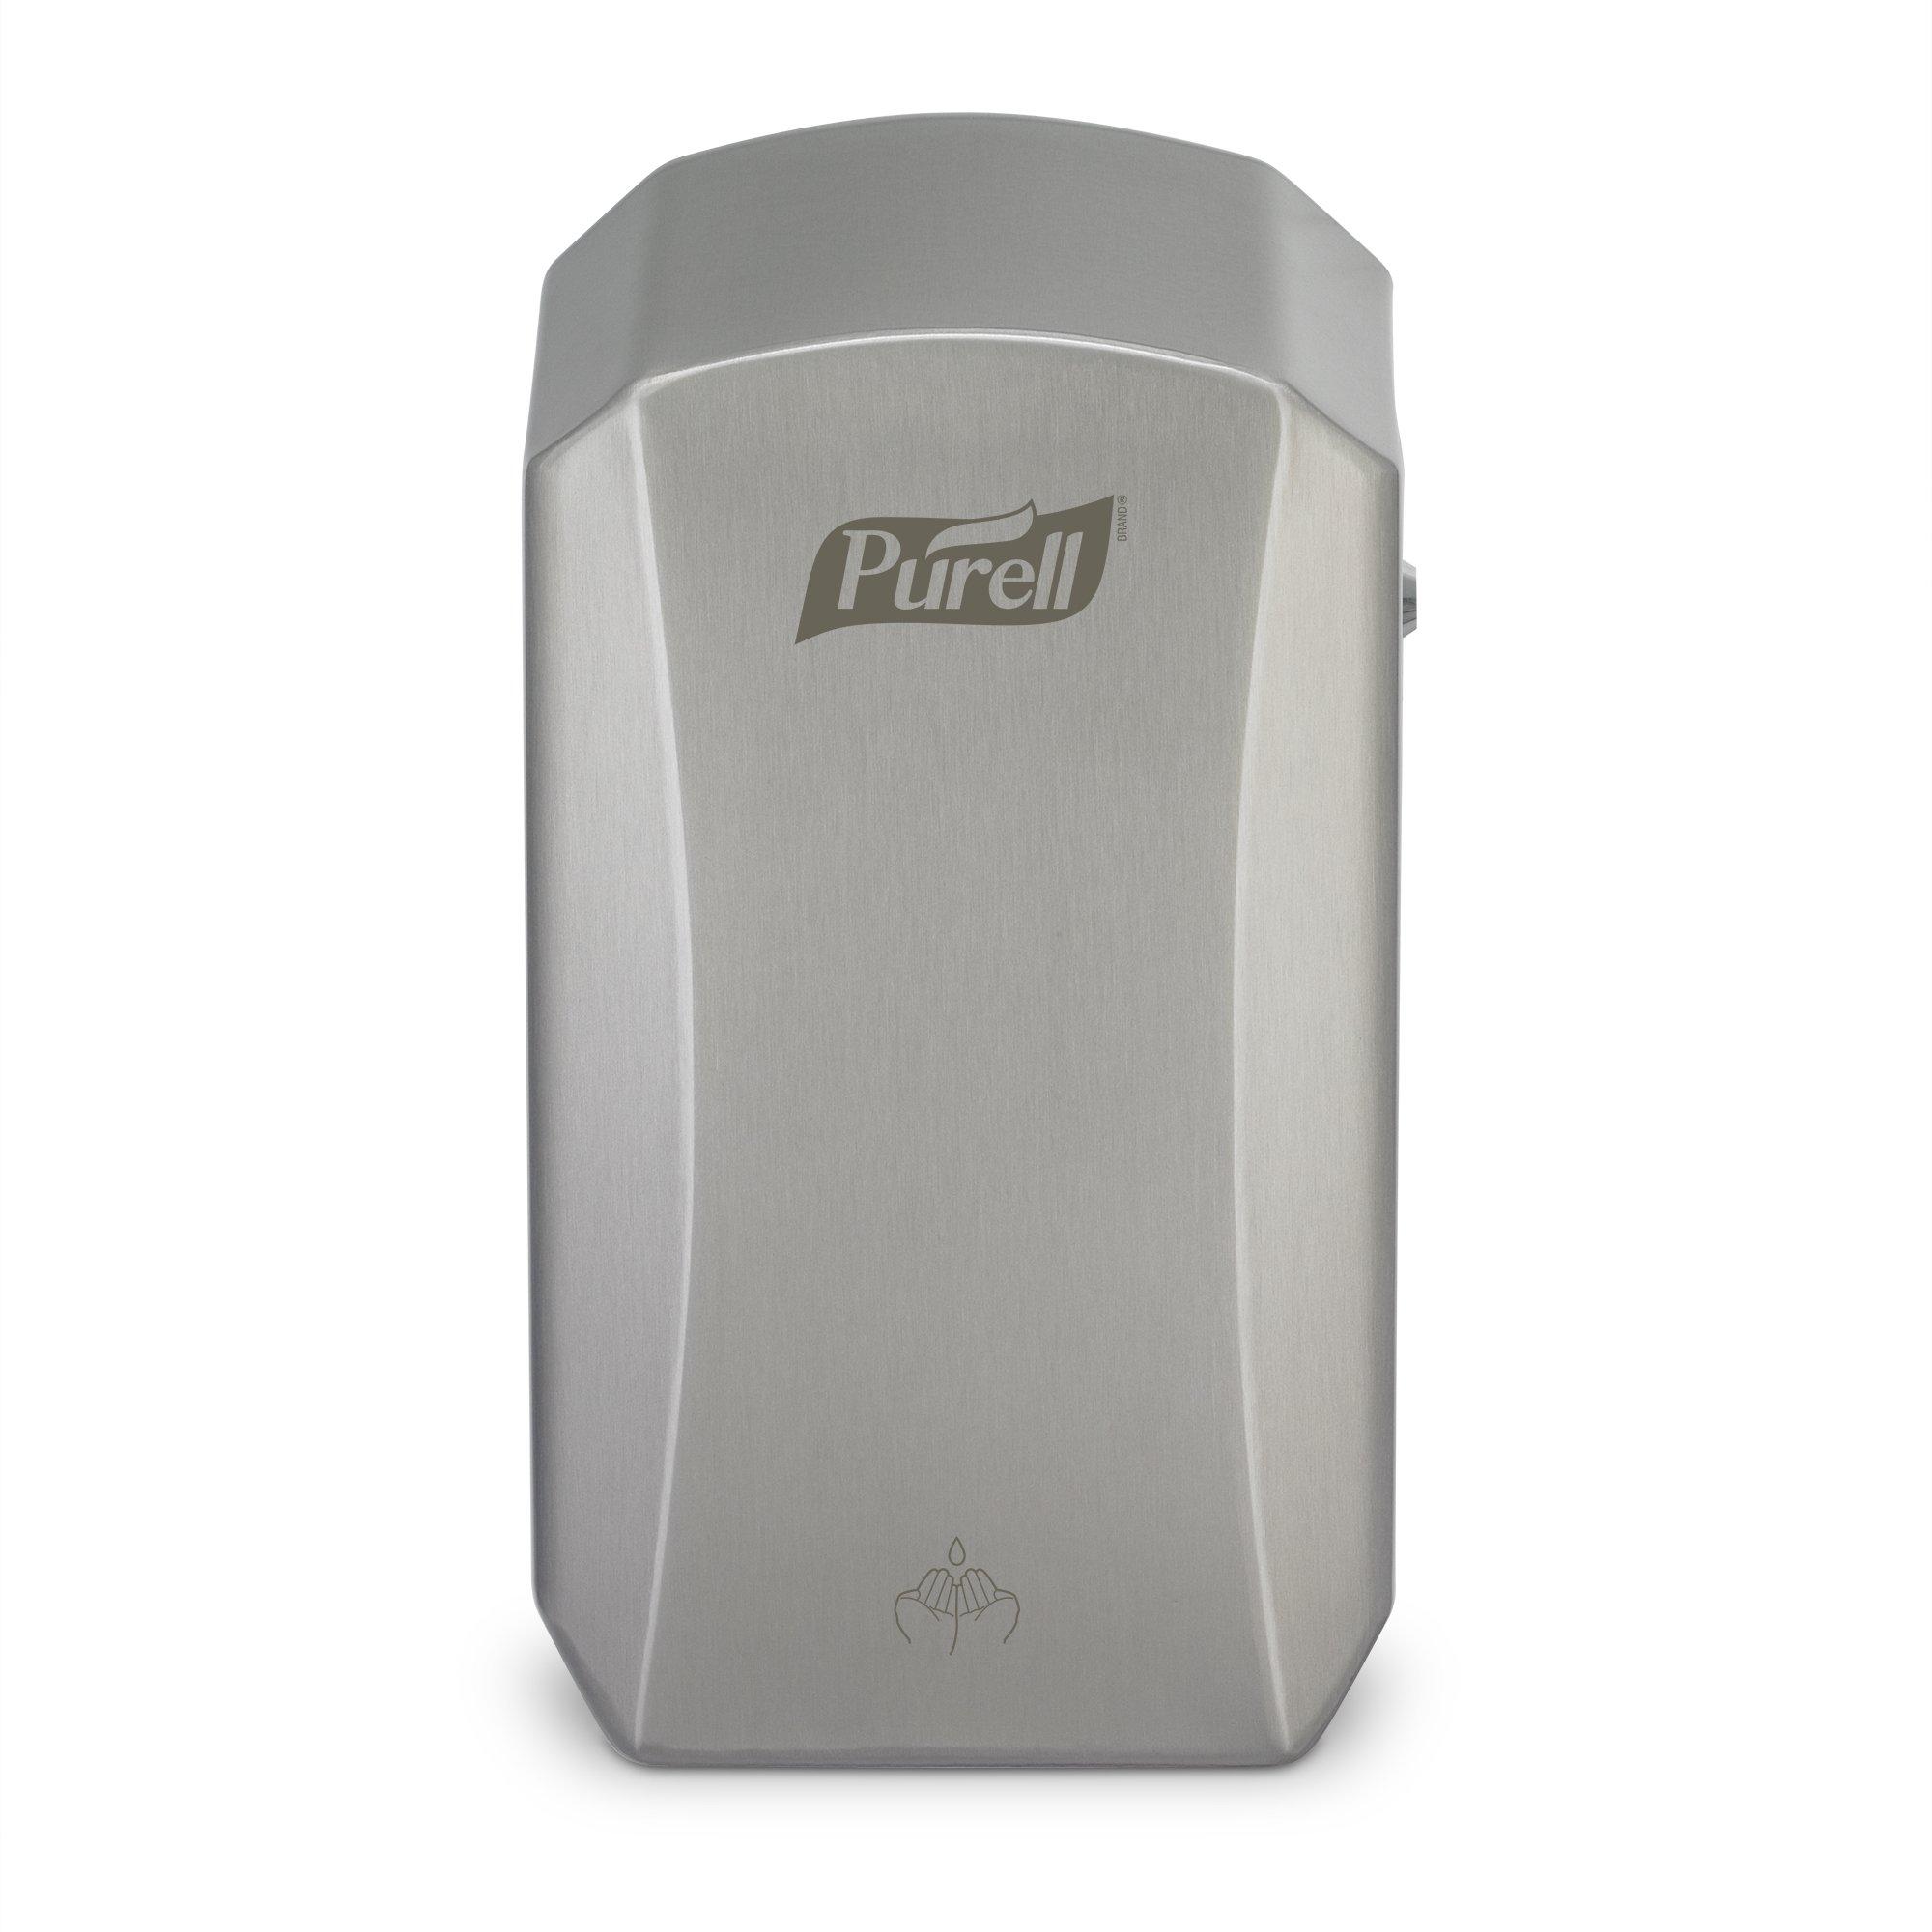 Purell 1926-01 LTX Behavioral Health Dispenser, Silver